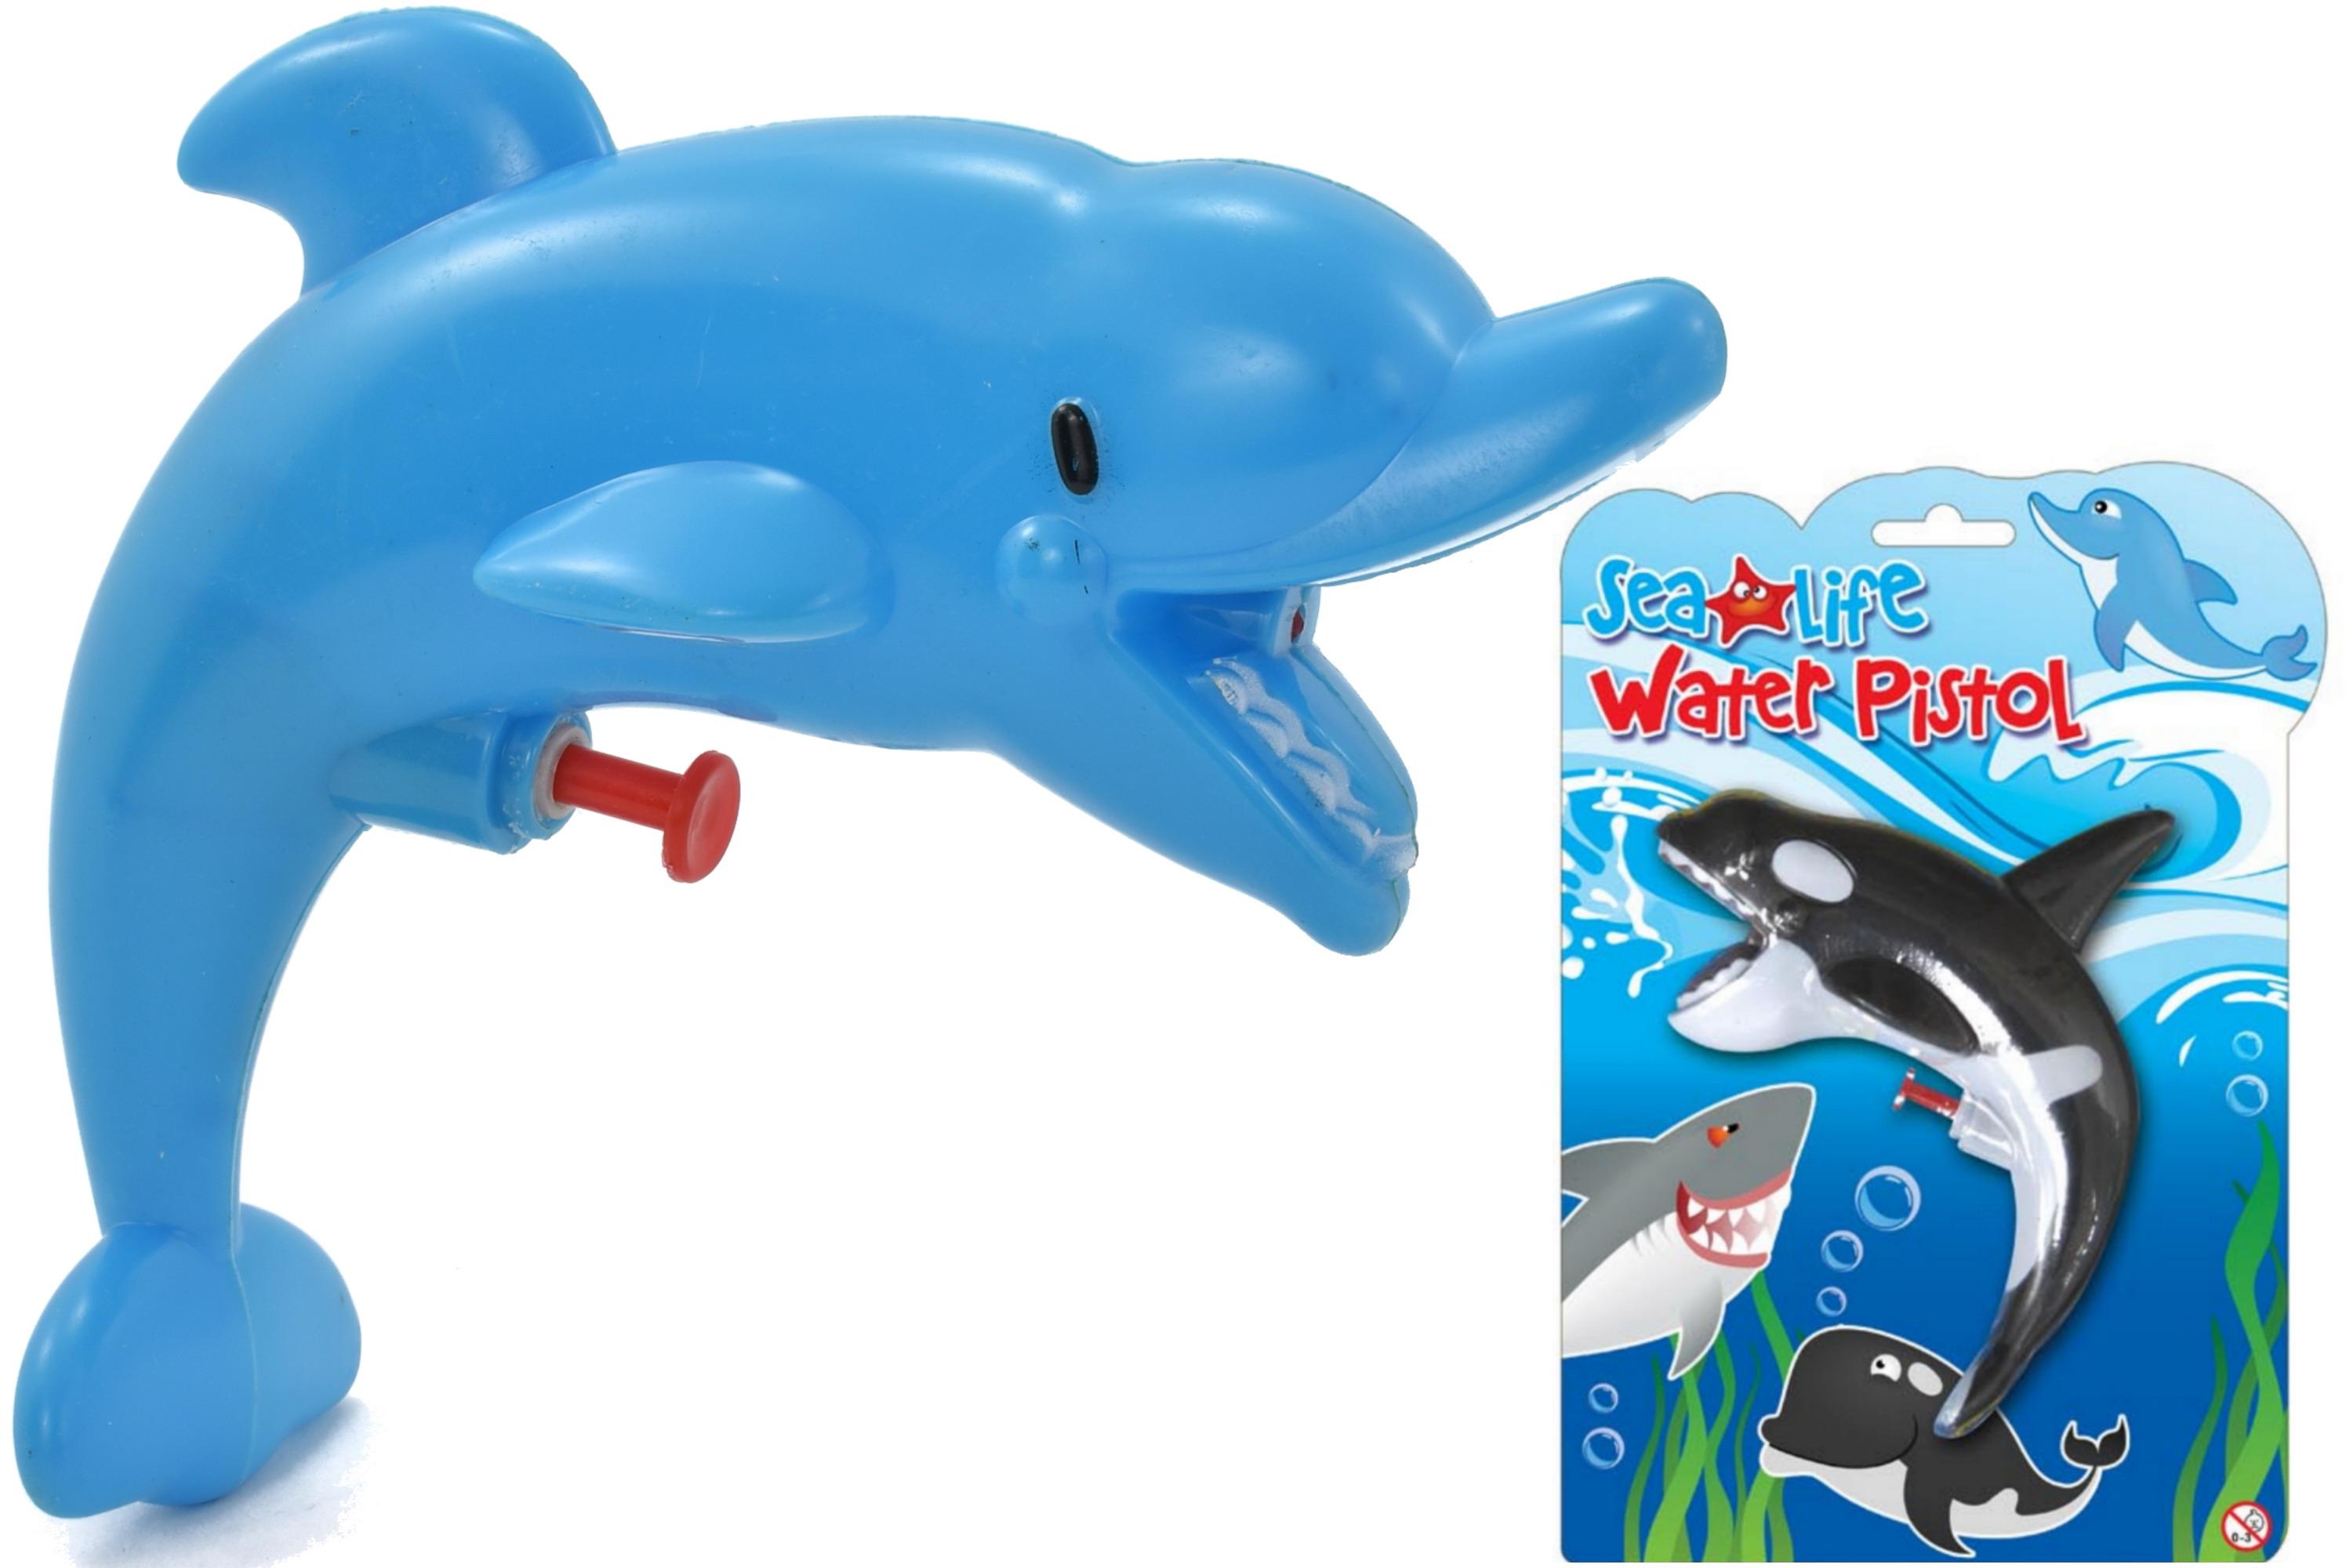 Sealife Water Pistol (3 Assorted) On Blistercard